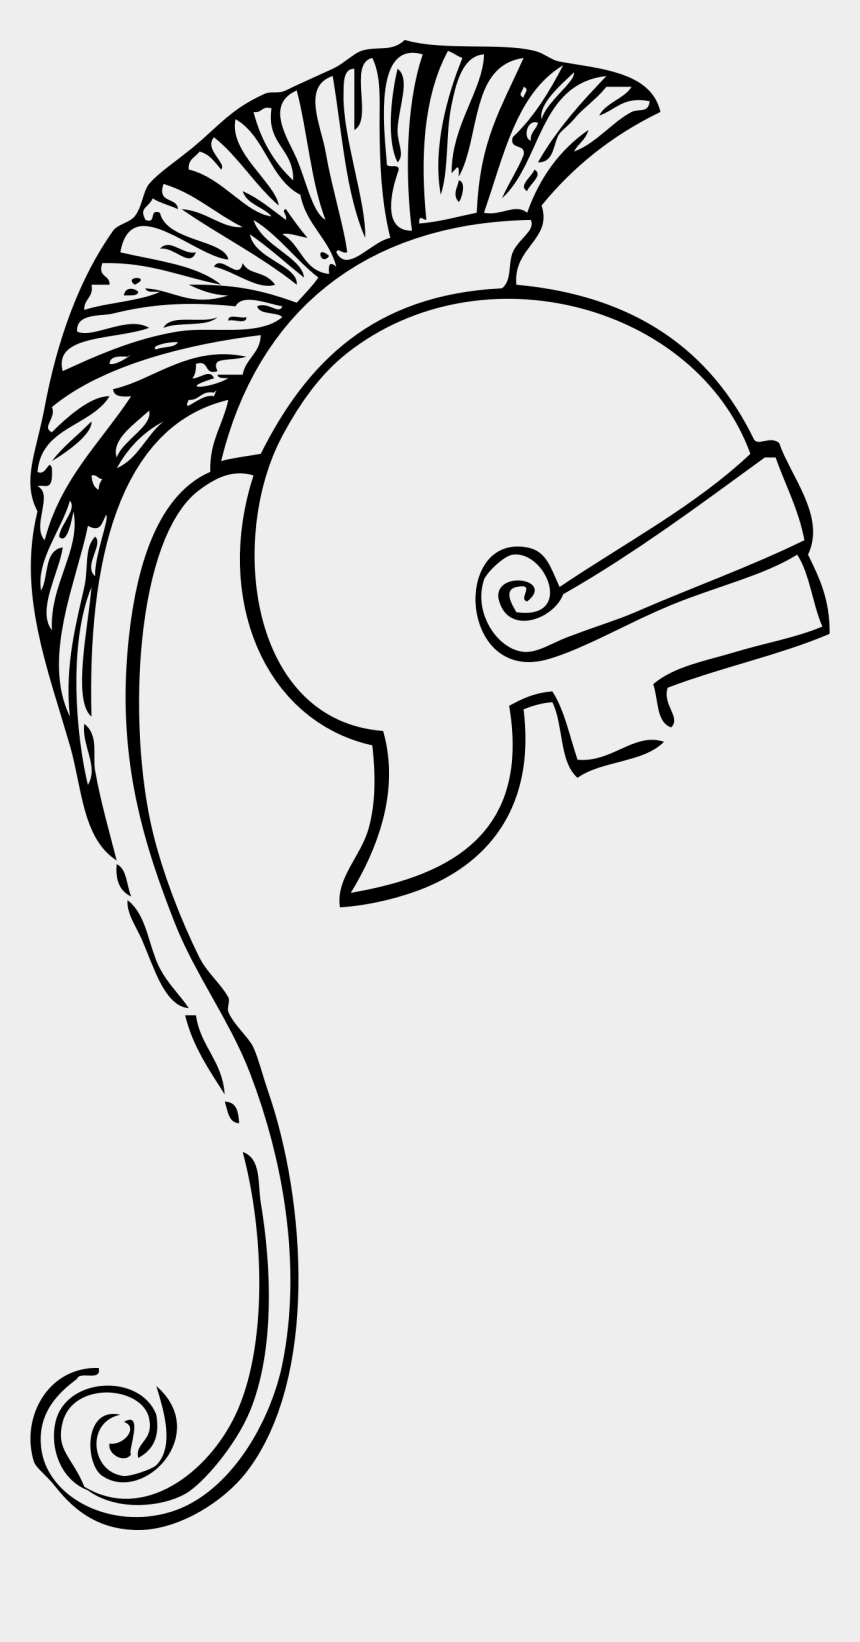 clipart teufel, Cartoons - Clipart Greek Helmet - Ancient Greece Drawings Easy